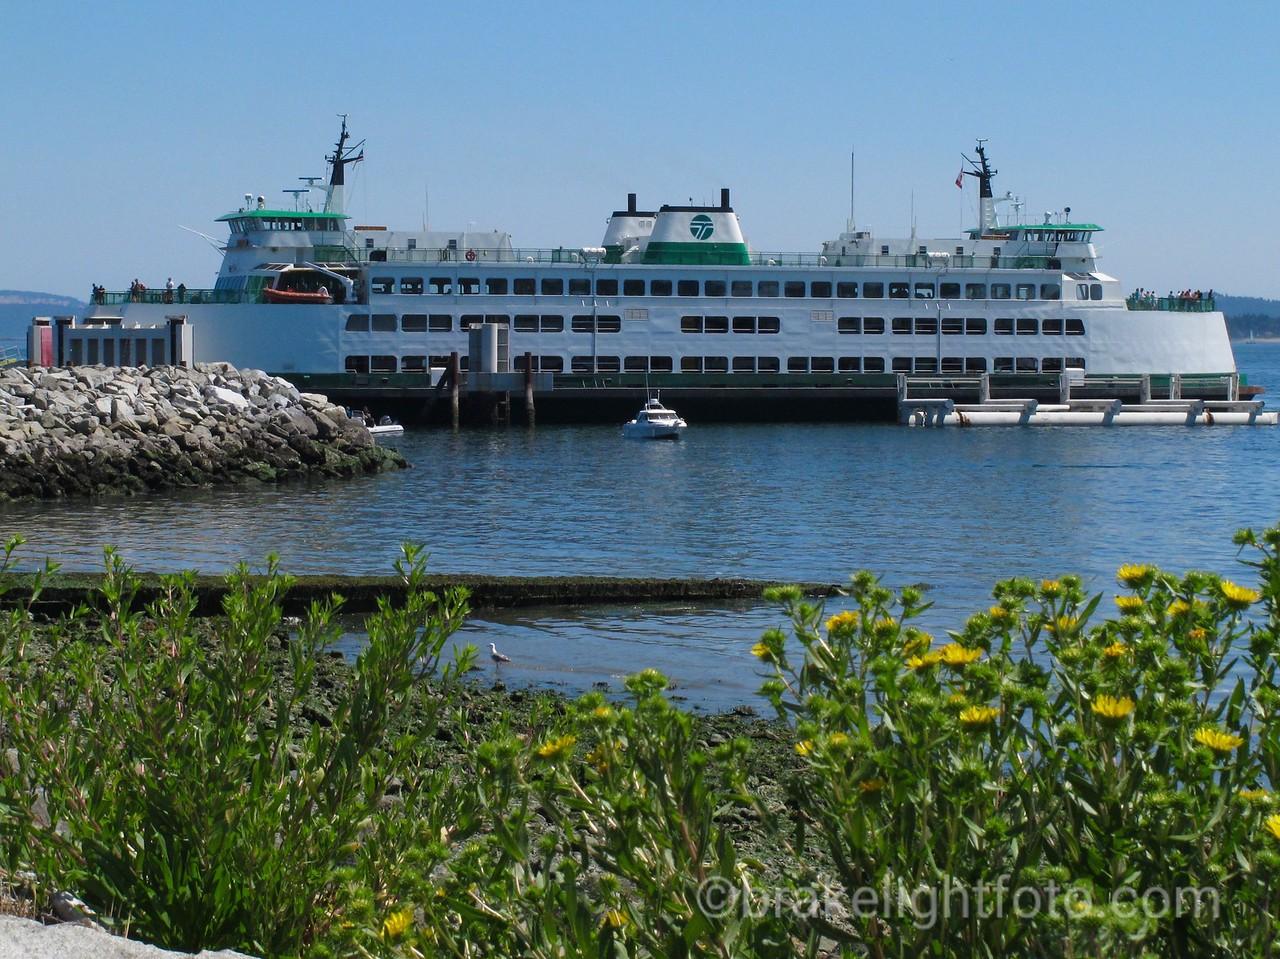 The Anacortes Ferry